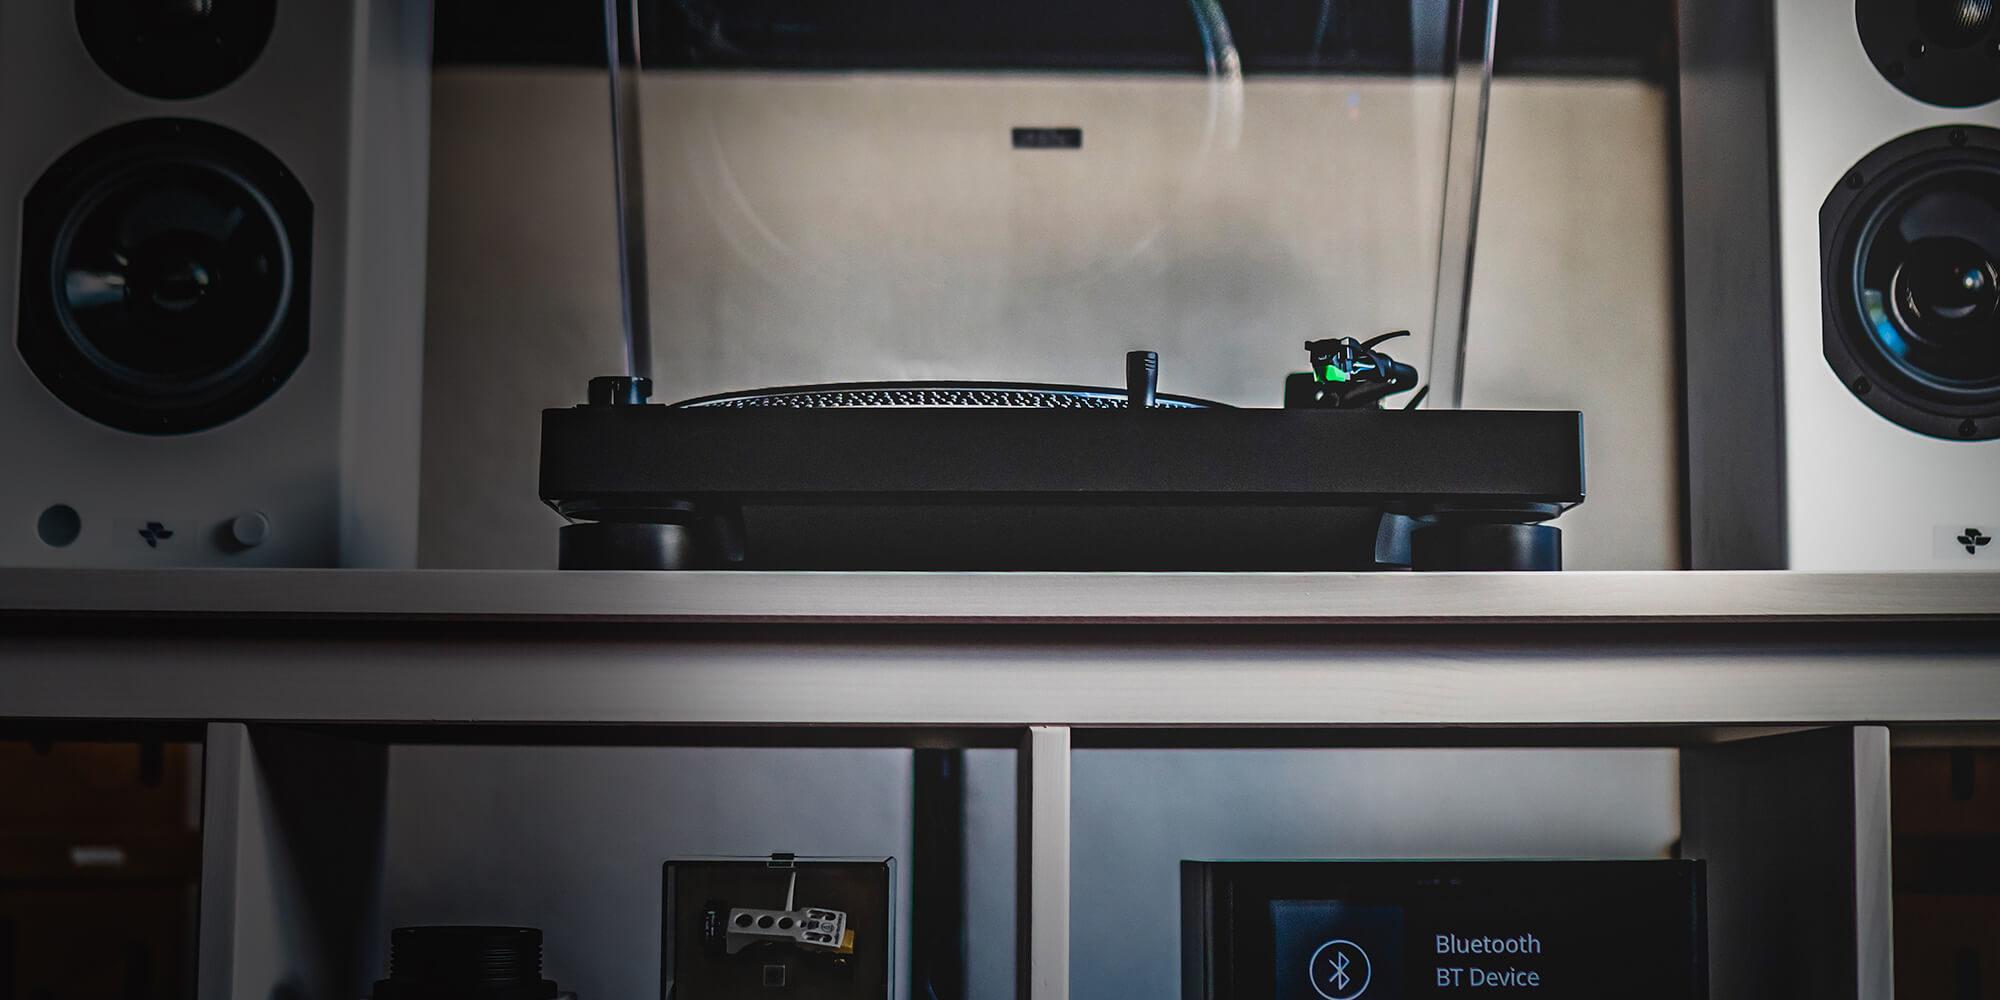 Audio-Technica AT-LP120XBT-USB